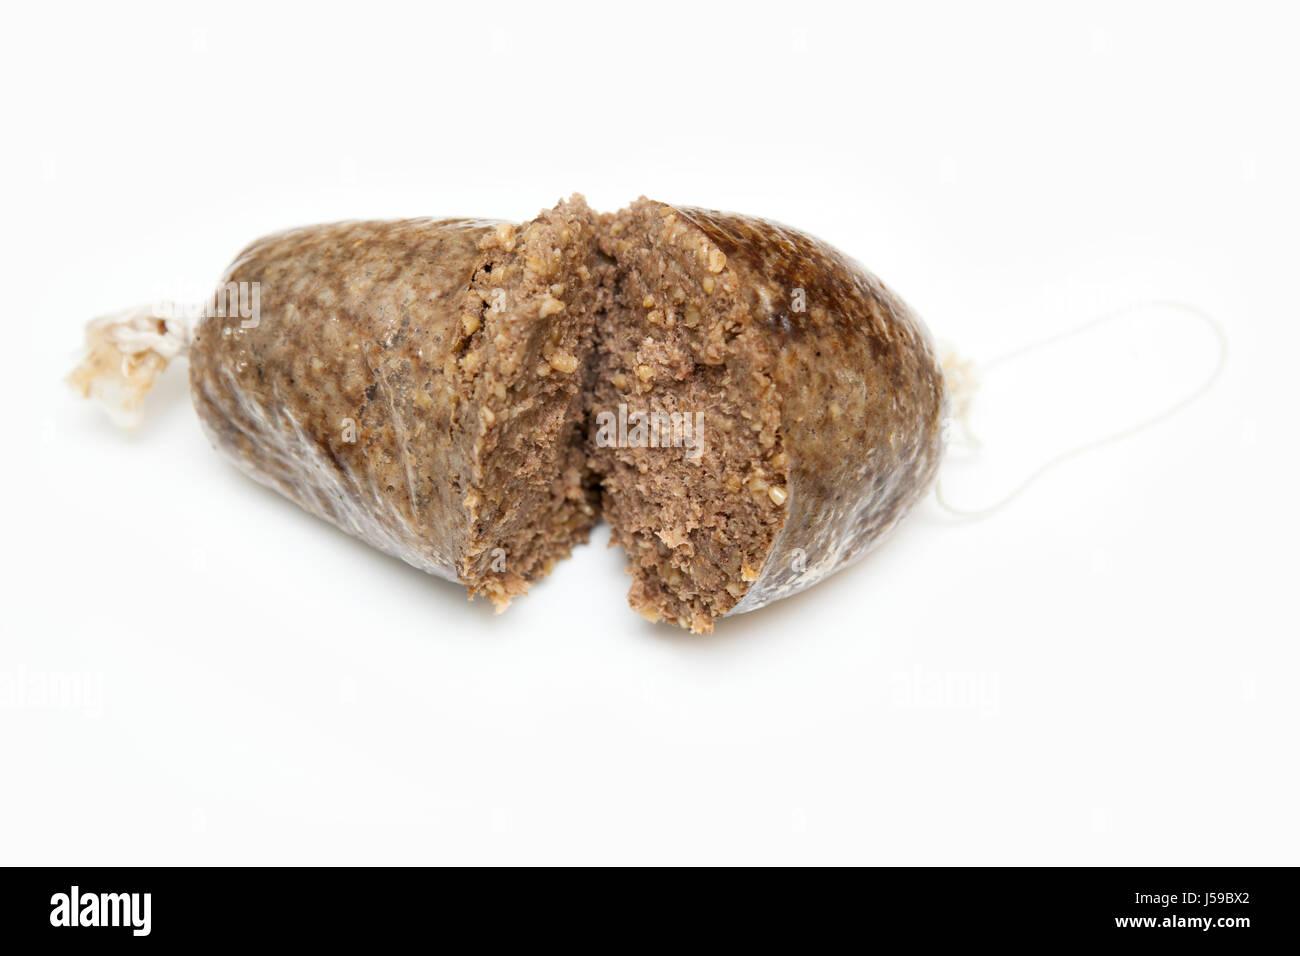 Cooked Scottish haggis isolated on a white studio background. - Stock Image